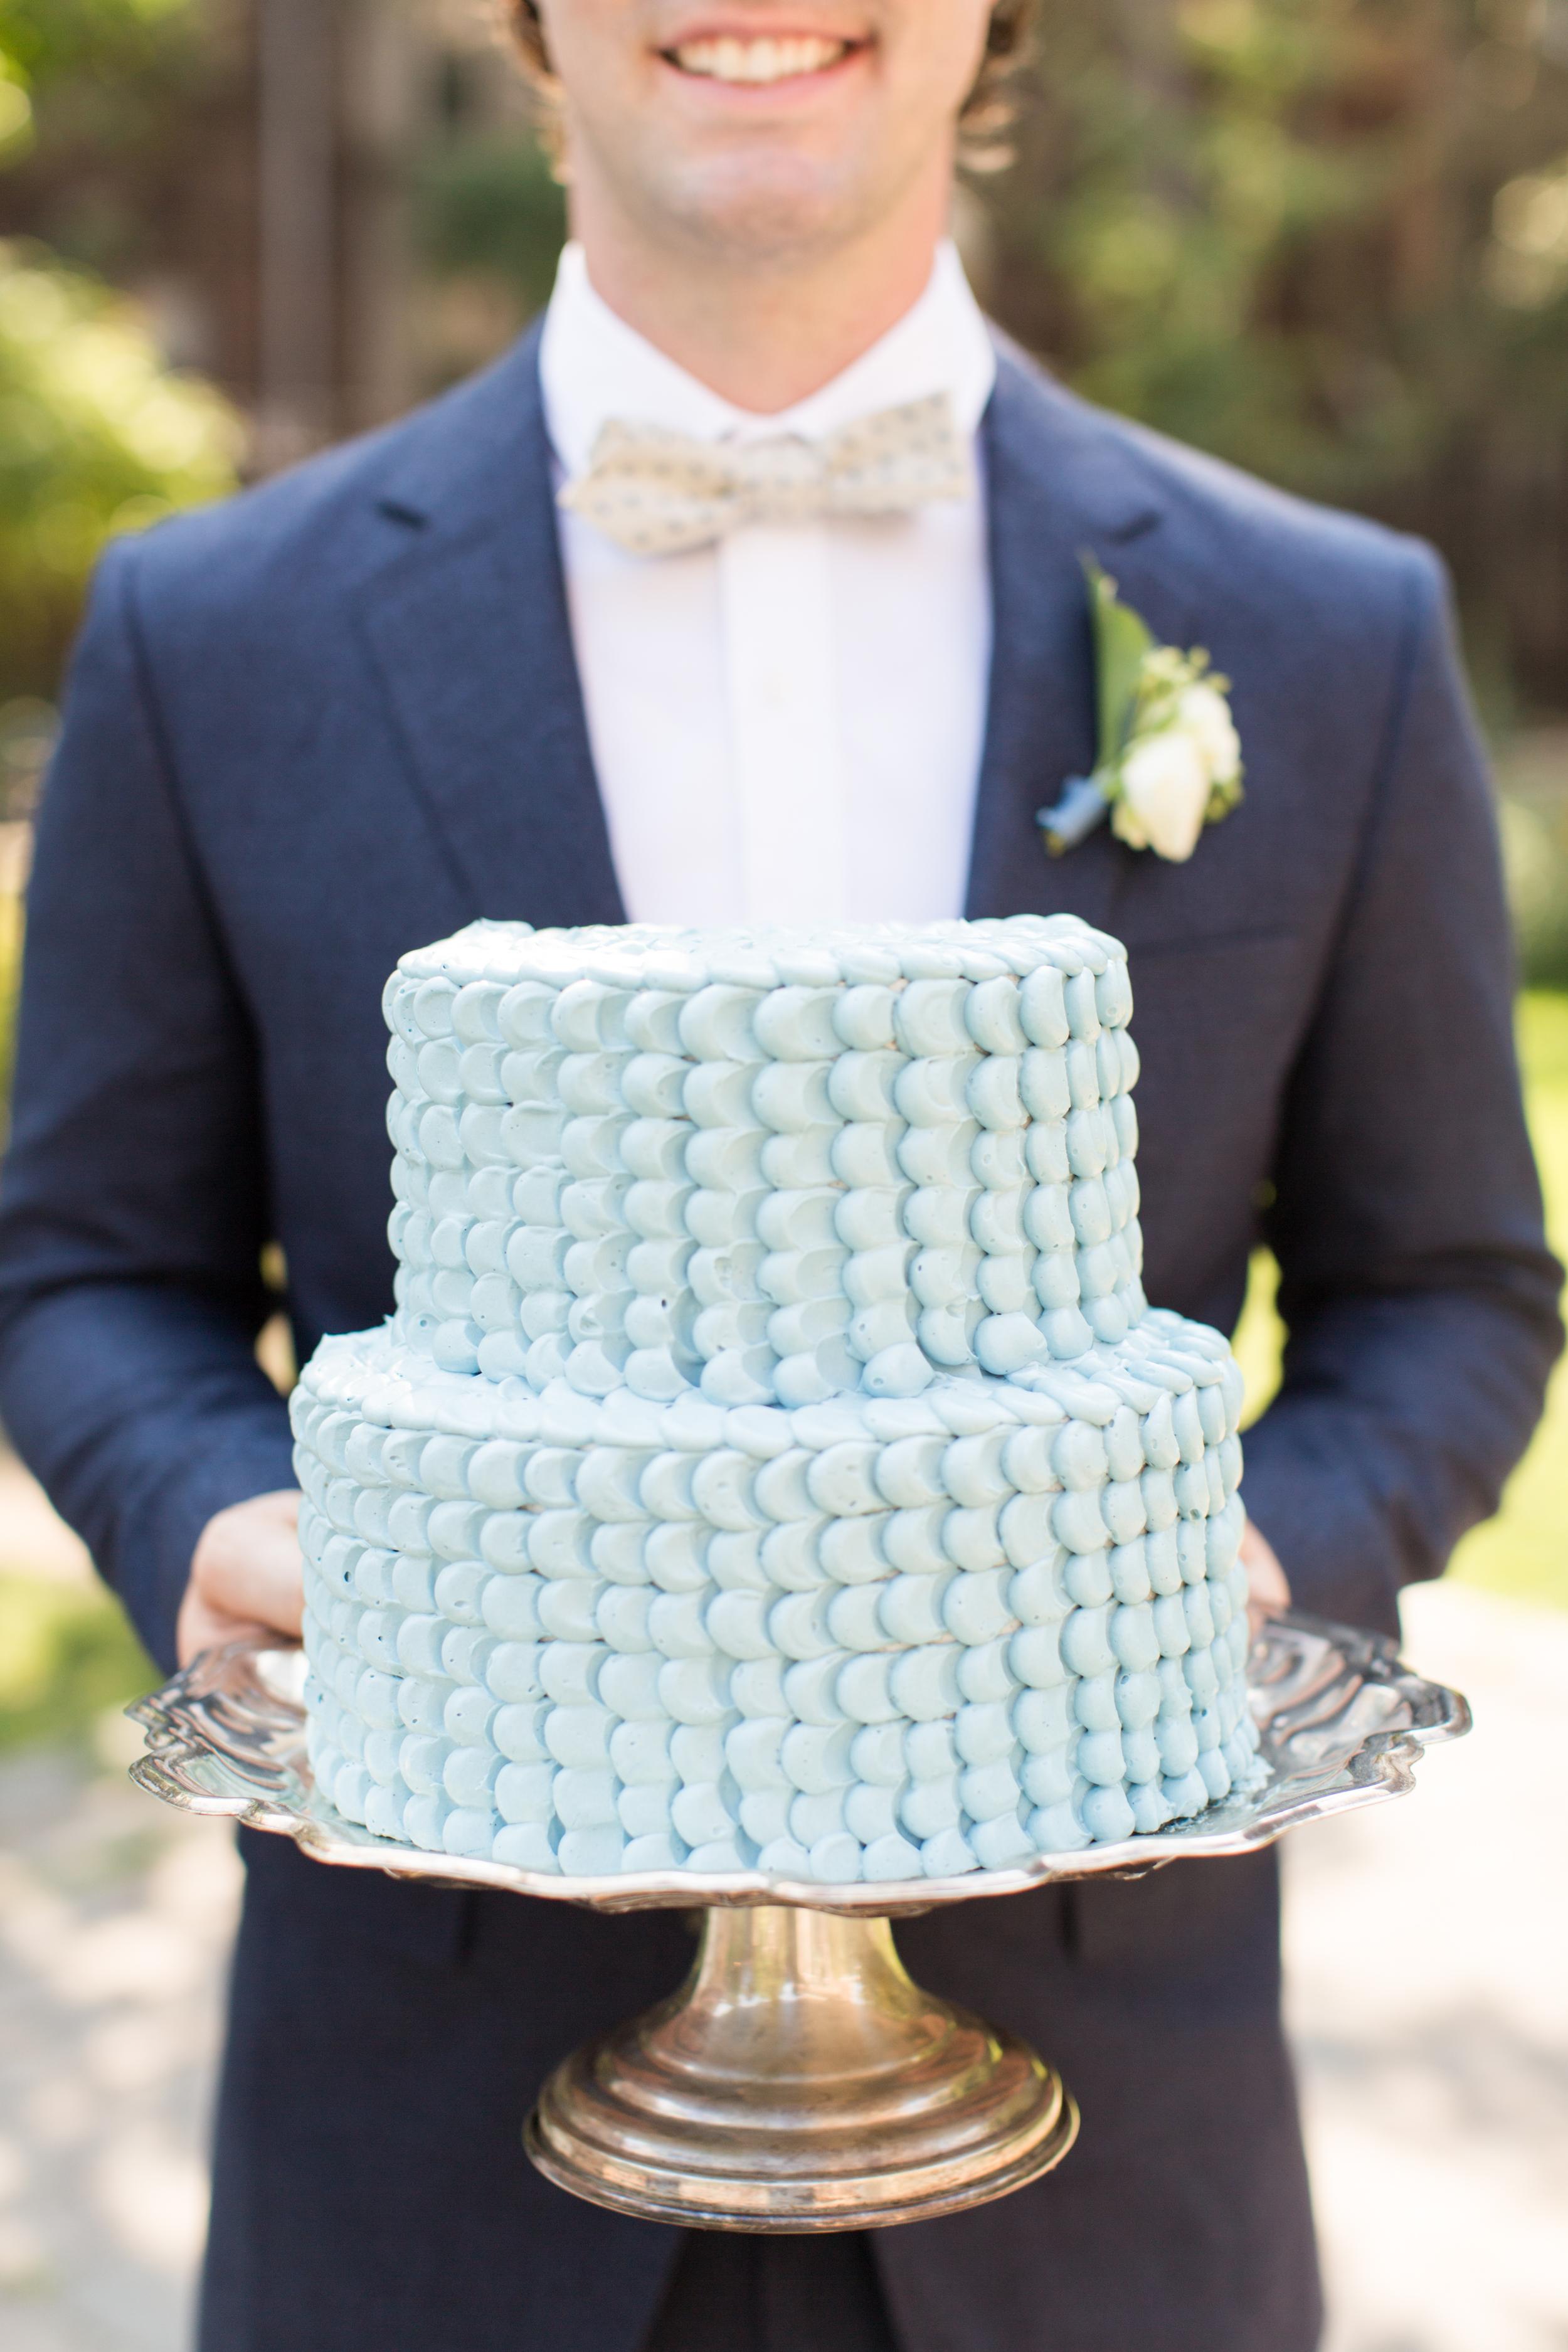 hannah_shih_hanaluluco_cj_isaac_charlie_juliet_ombre_chambray_prospect_park_brooklyn_wedding_20.jpg